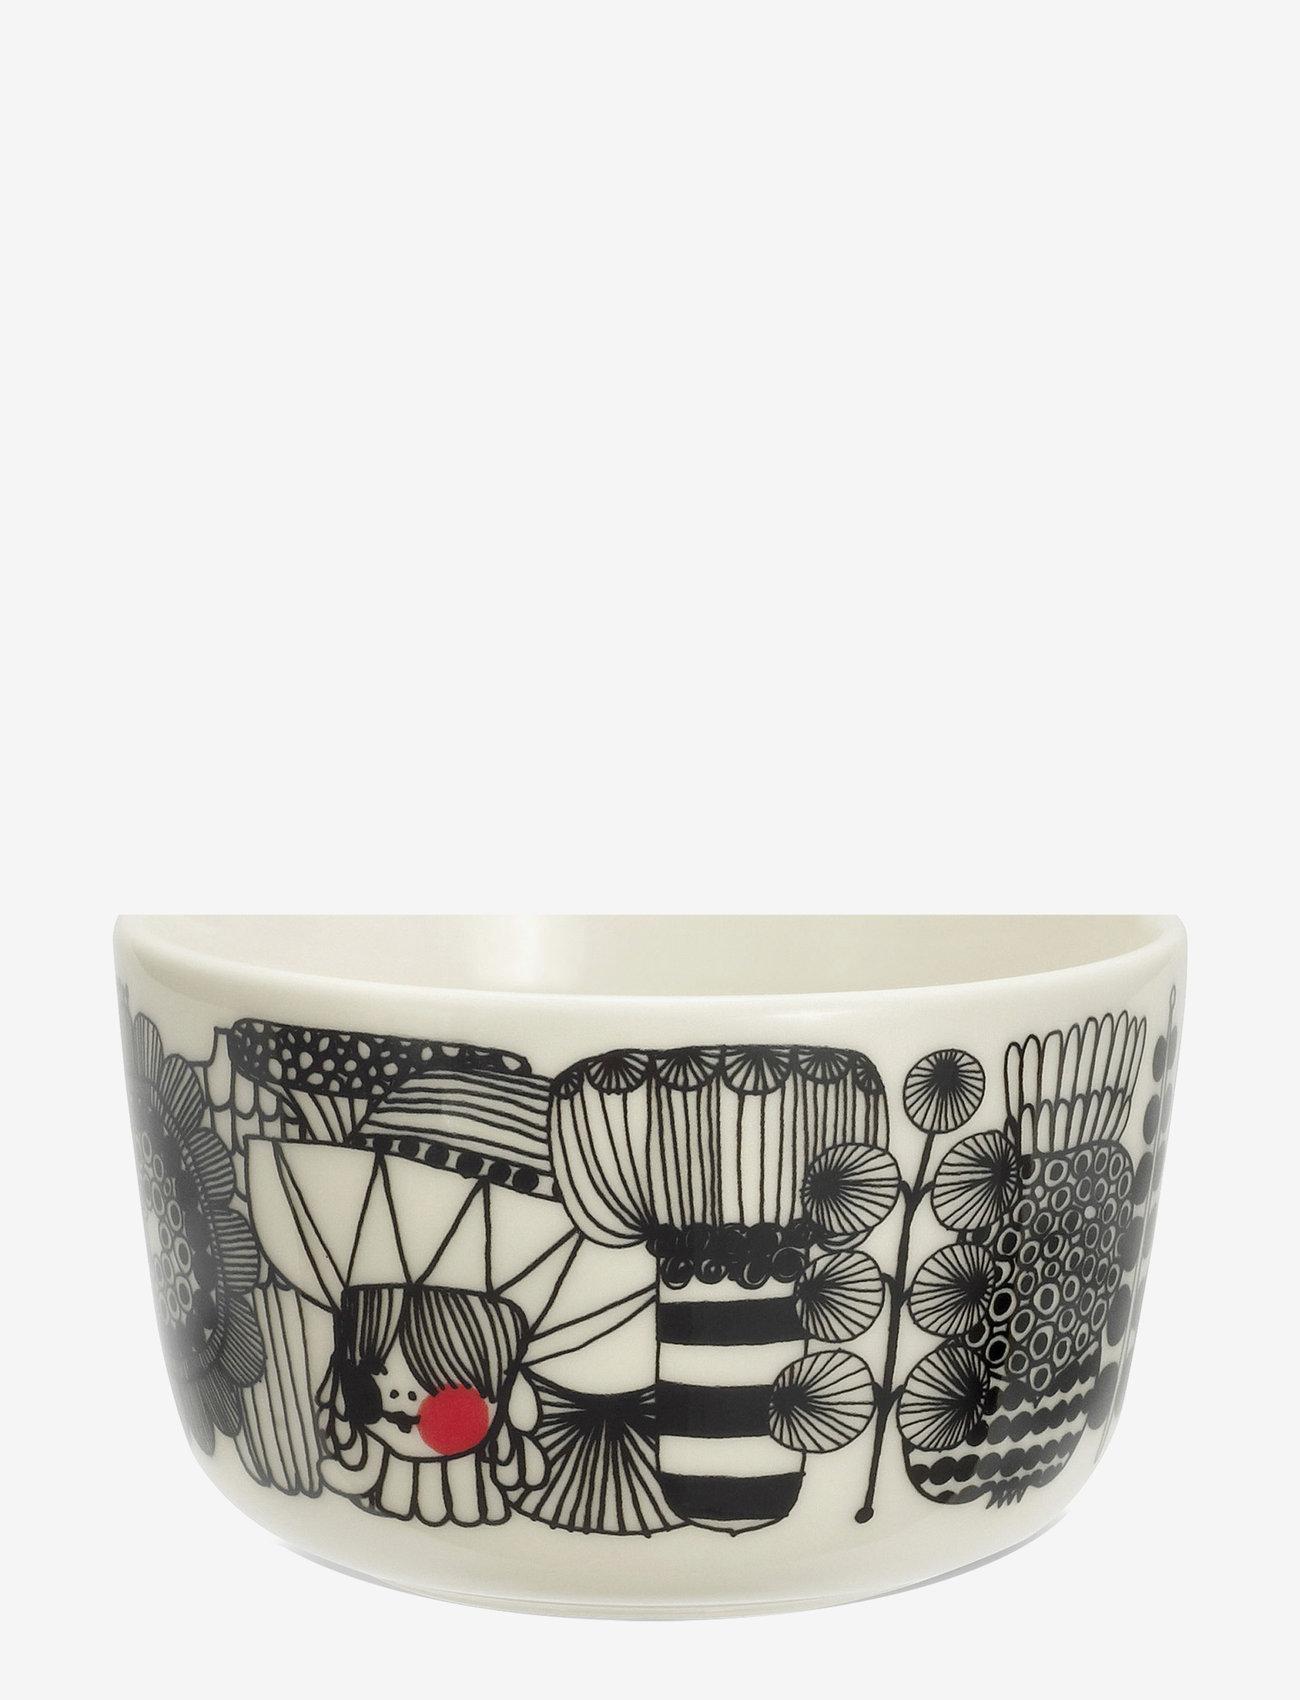 Marimekko Home - SIIRTOLAPUUTARHA BOWL - white,black,red - 0